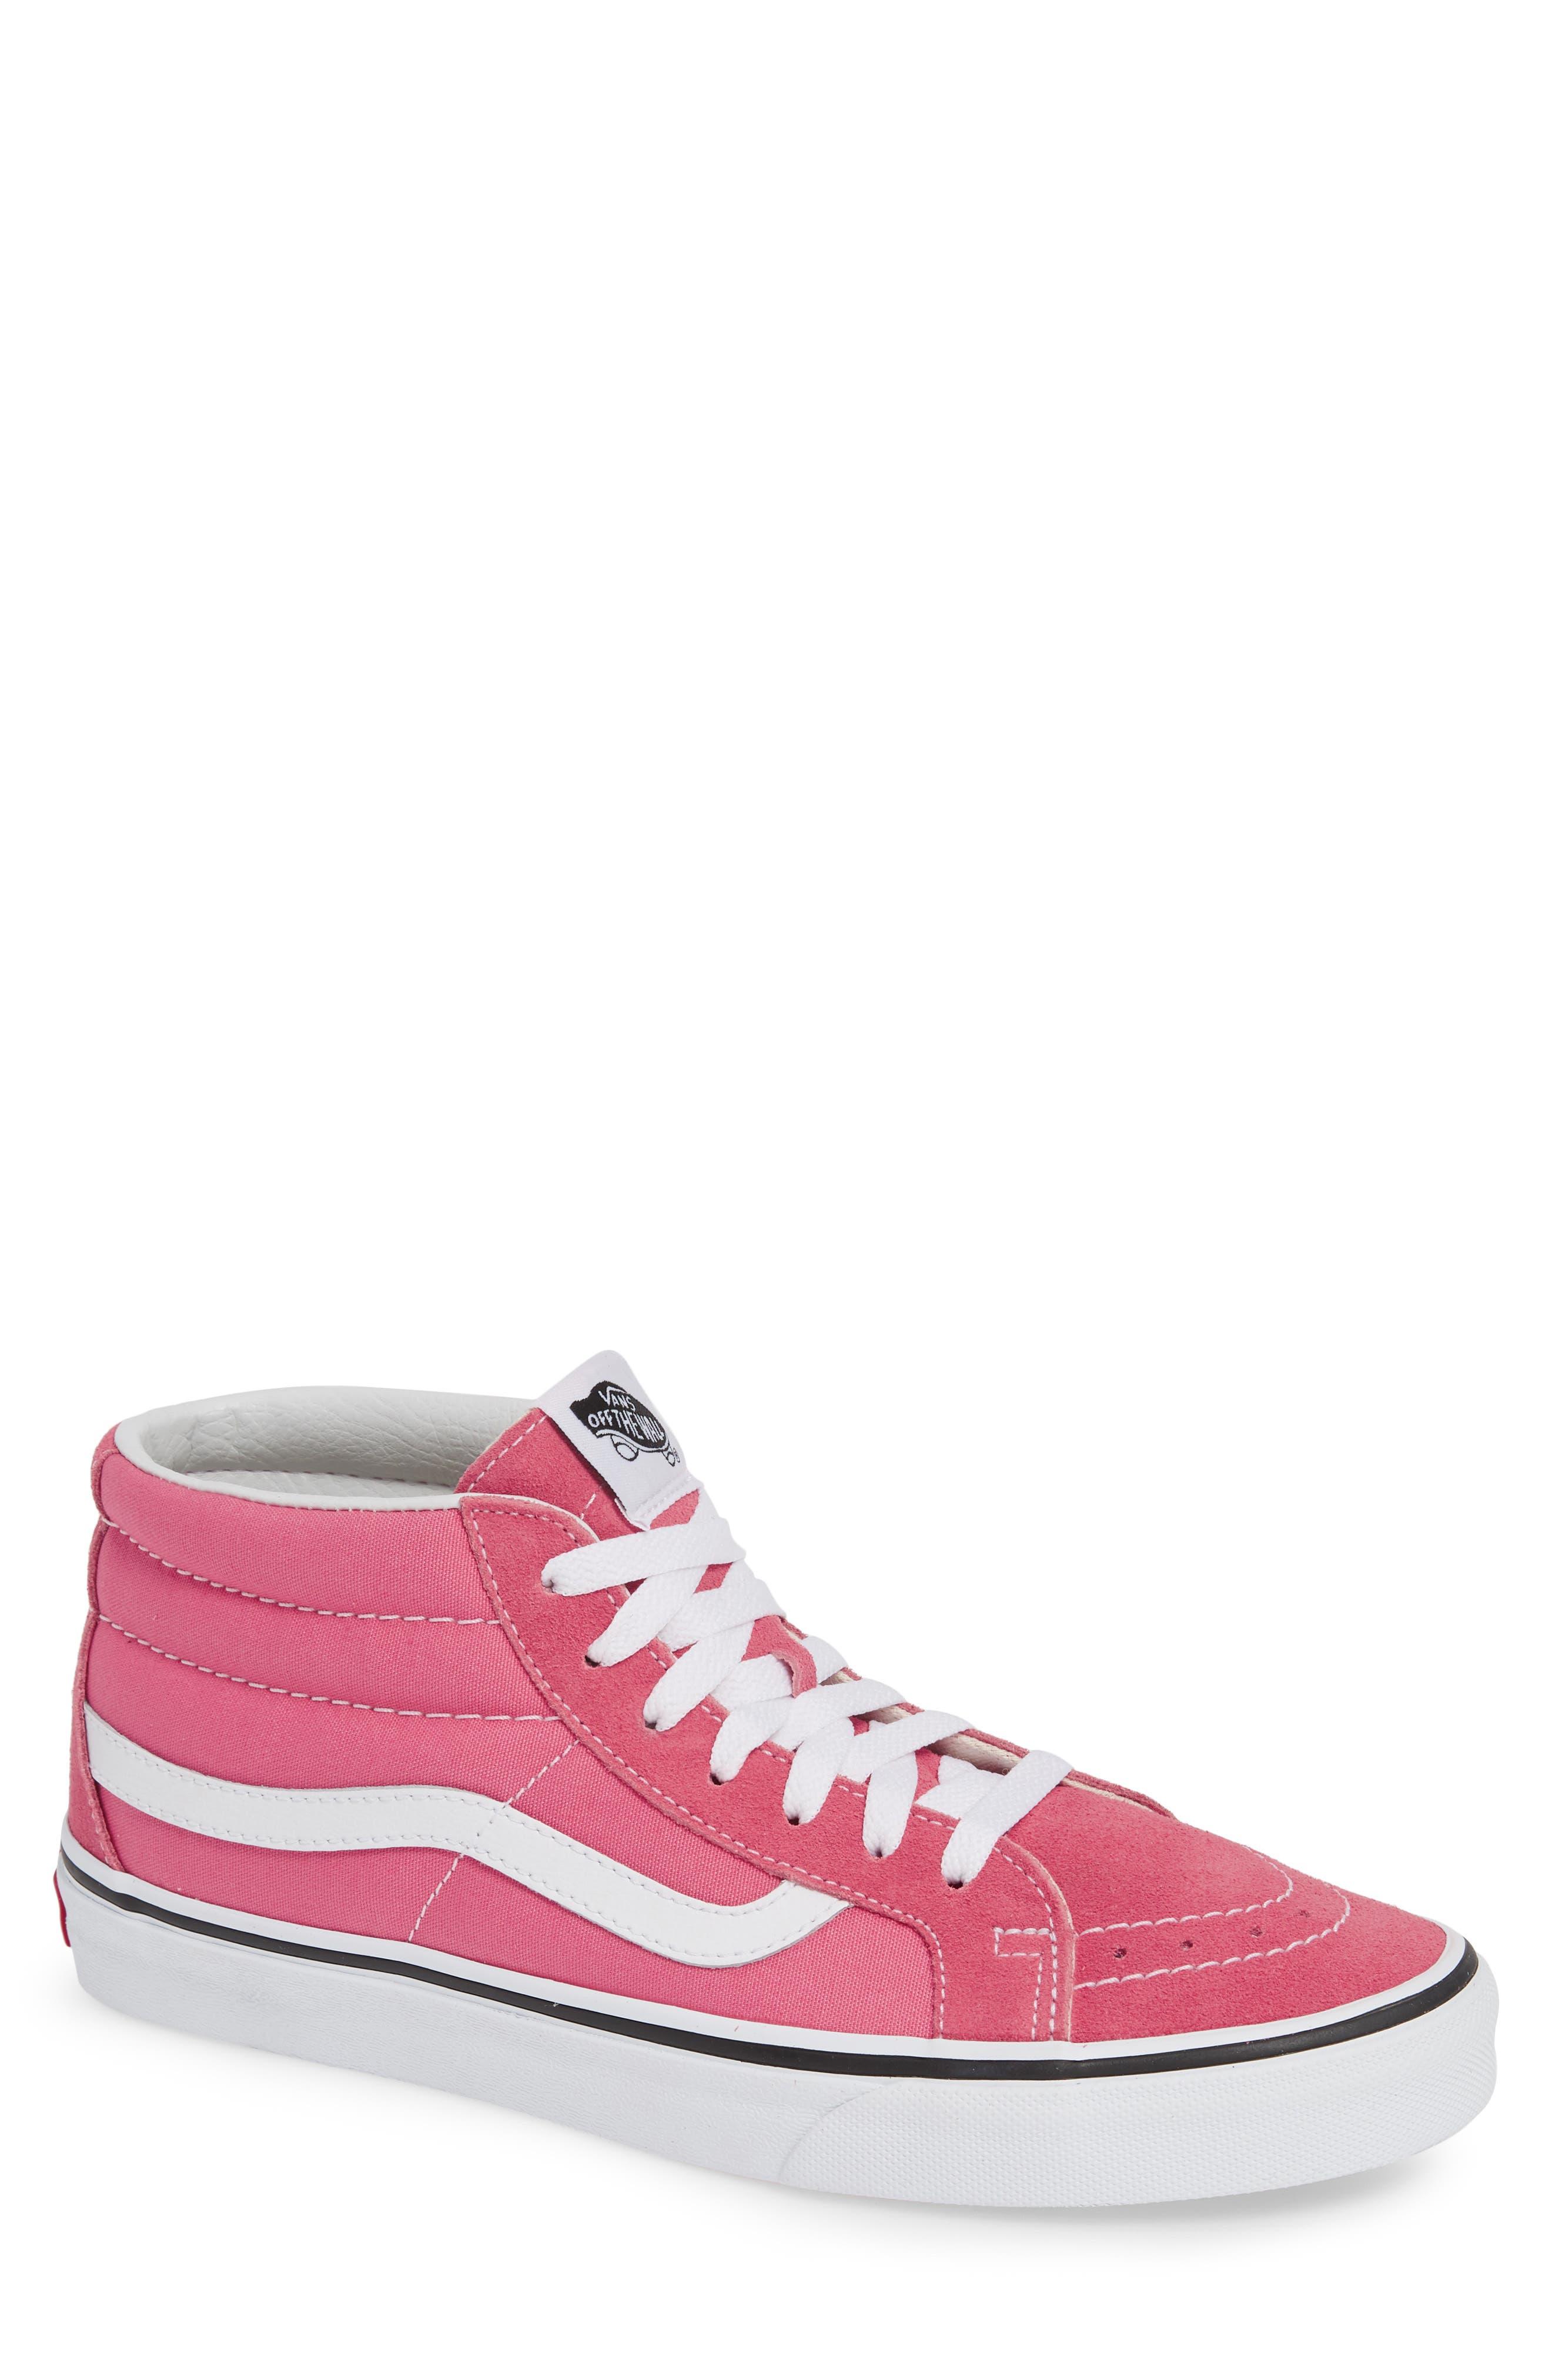 VANS,                             Sk8-Mid Reissue Sneaker,                             Main thumbnail 1, color,                             660